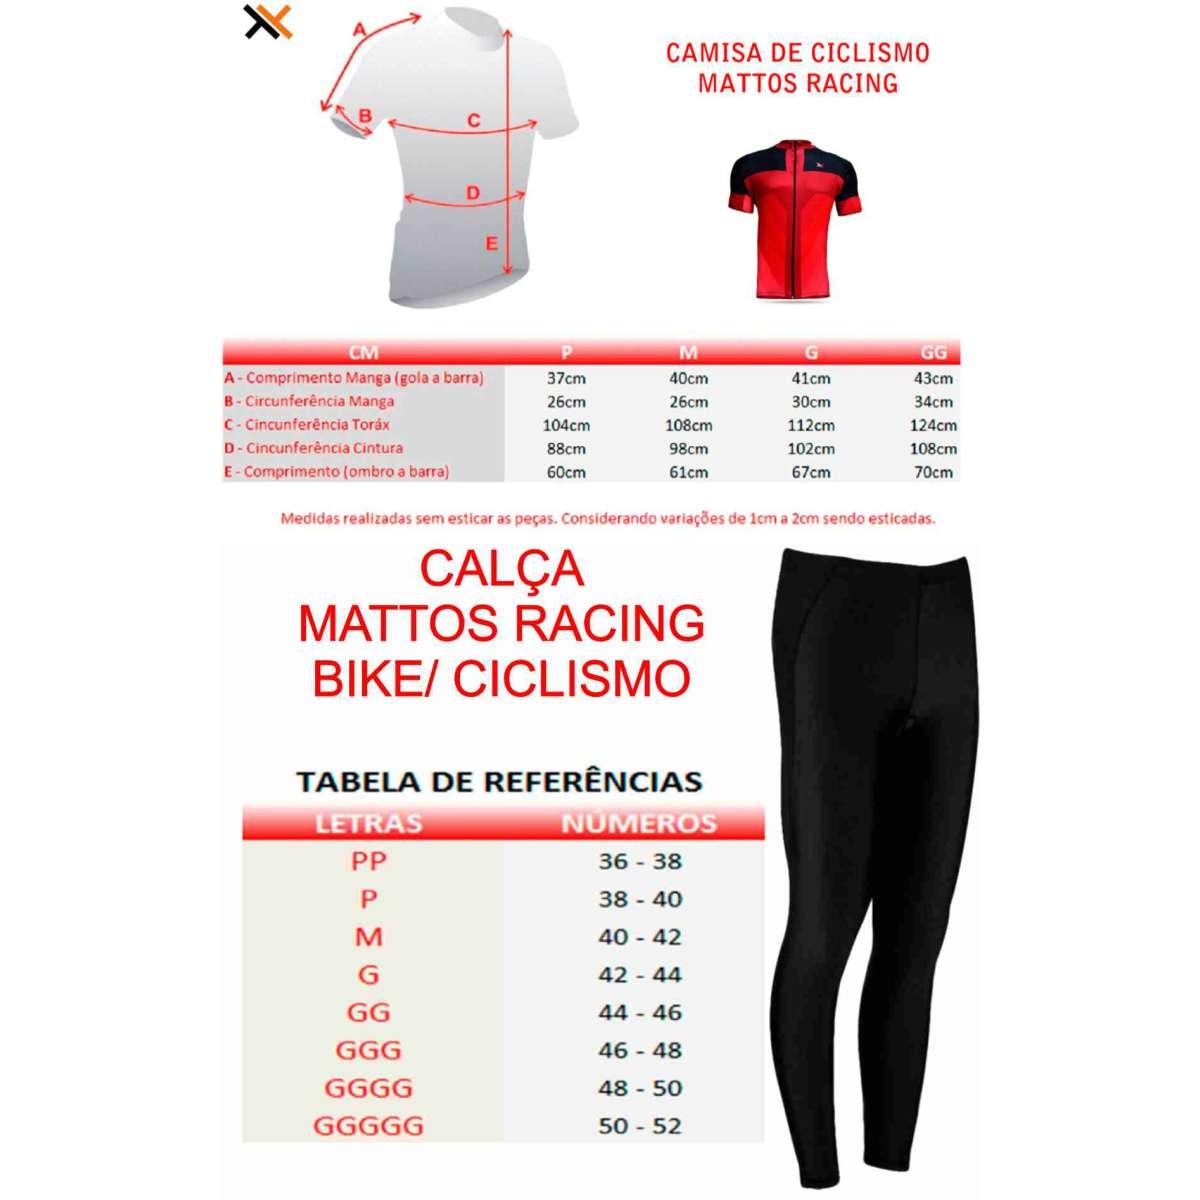 CONJUNTO CICLISMO CAMISA MATTOS RACING BIKE LISA MTB AZUL + CALÇA PRETO FORRO GEL MOUNTAIN BIKE